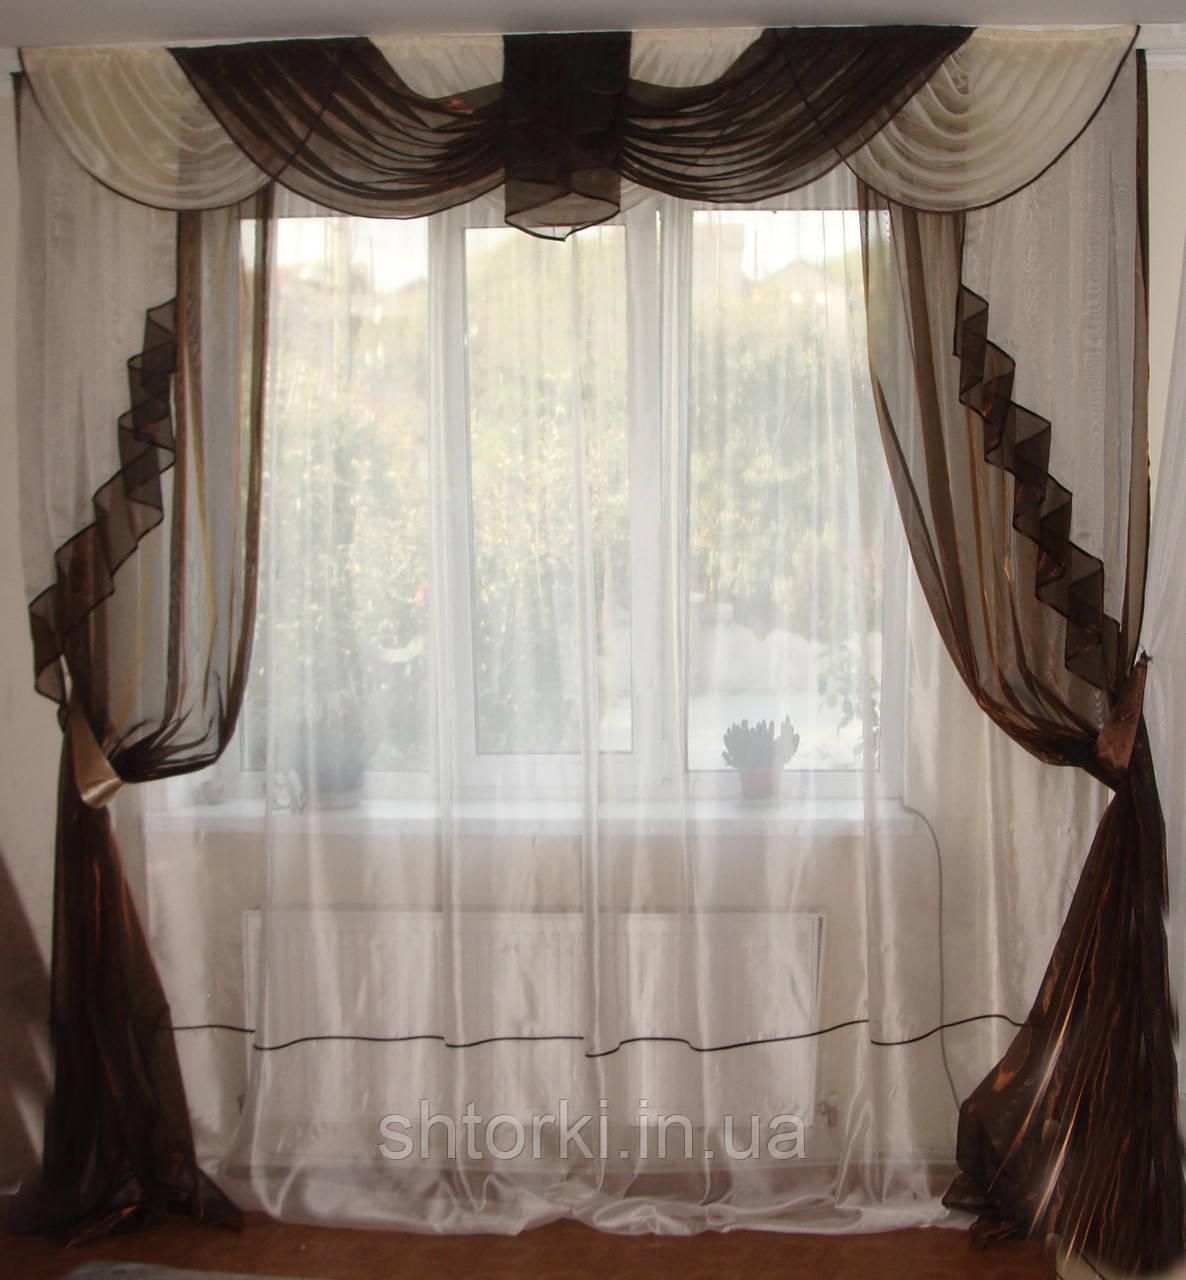 Комплект классика  Органза 2,5м, тюль шторы ламбрекен